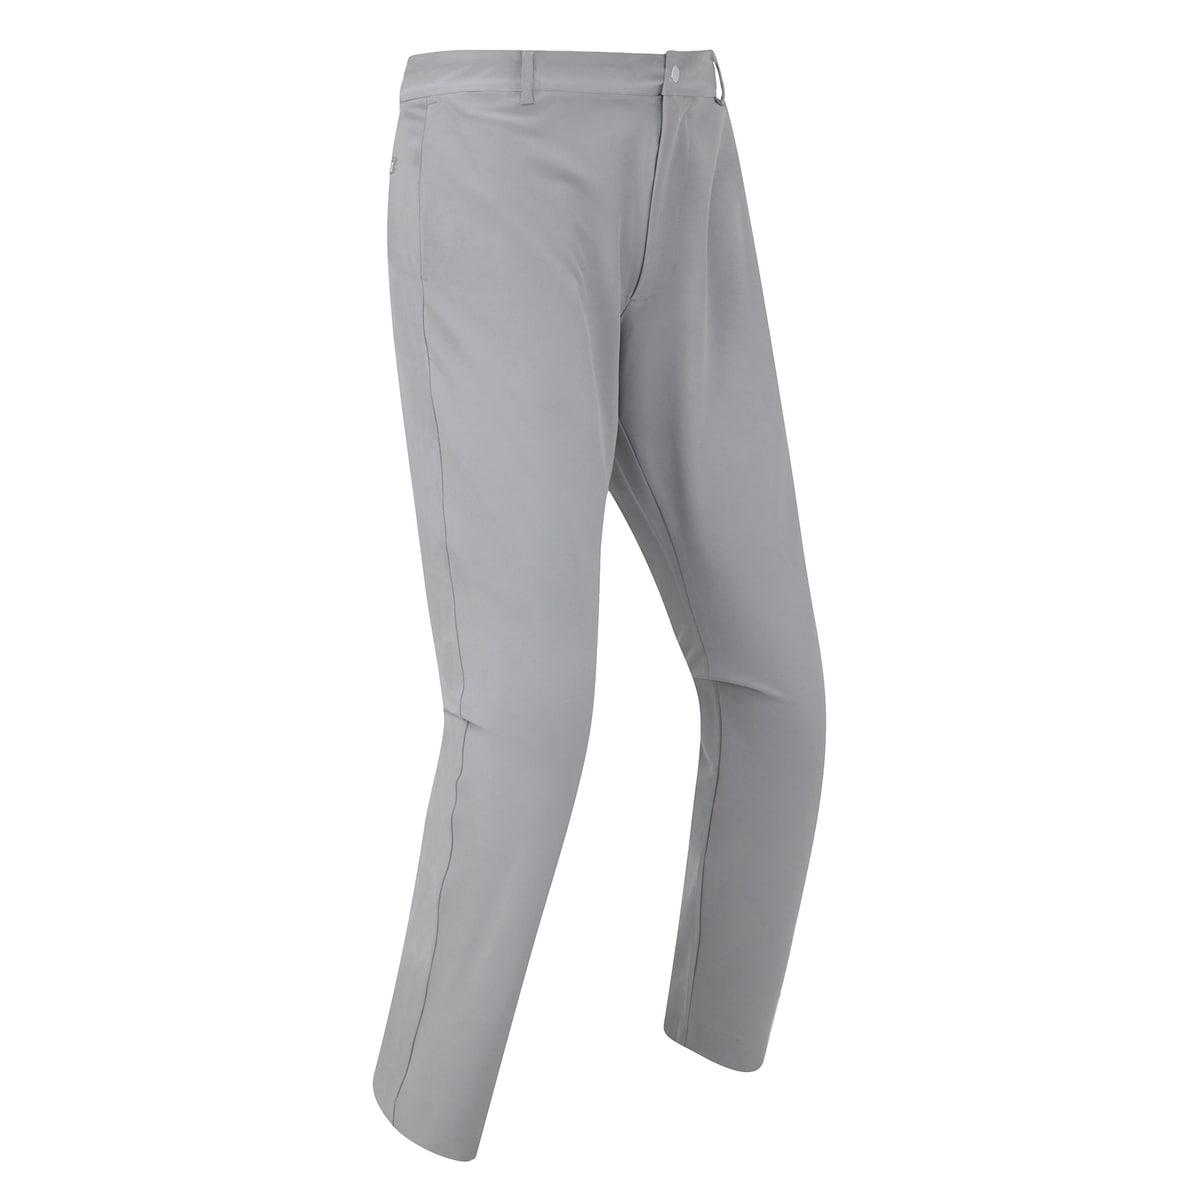 FJ Lite Tapered Fit Trousers